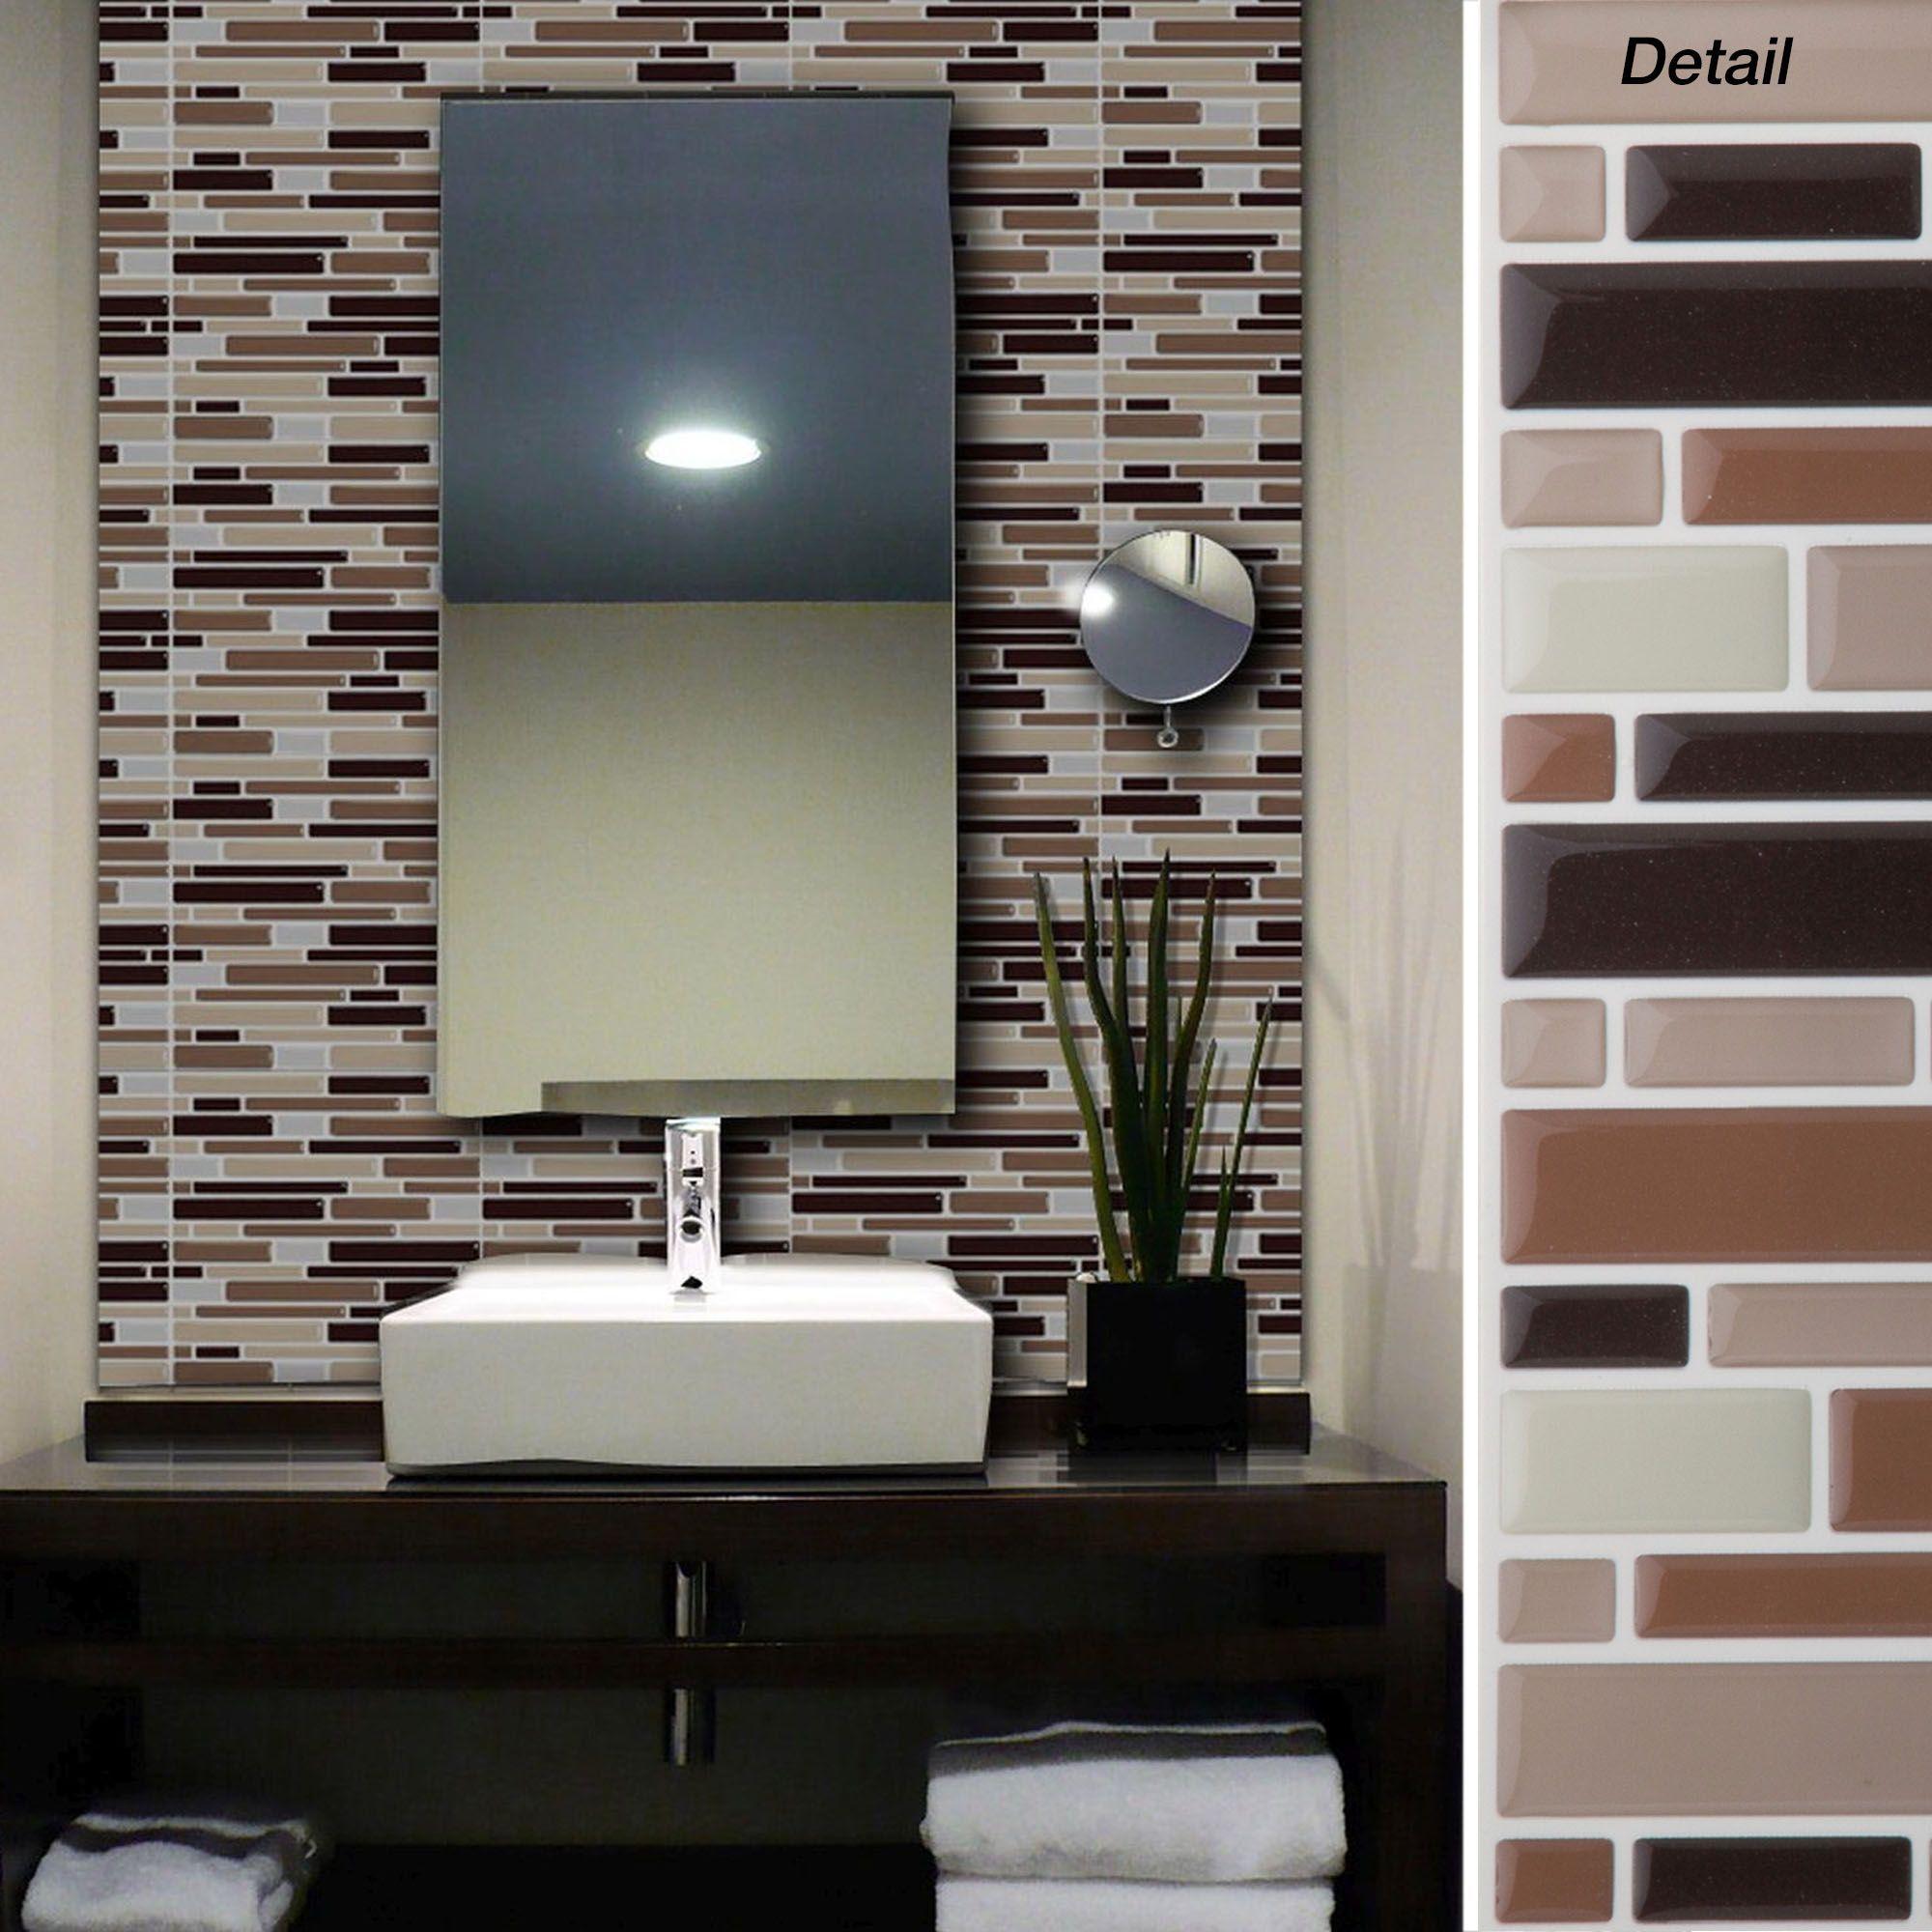 Self Adhesive Glass Wall Tiles Jc Designs Ideas Pinterest Wall